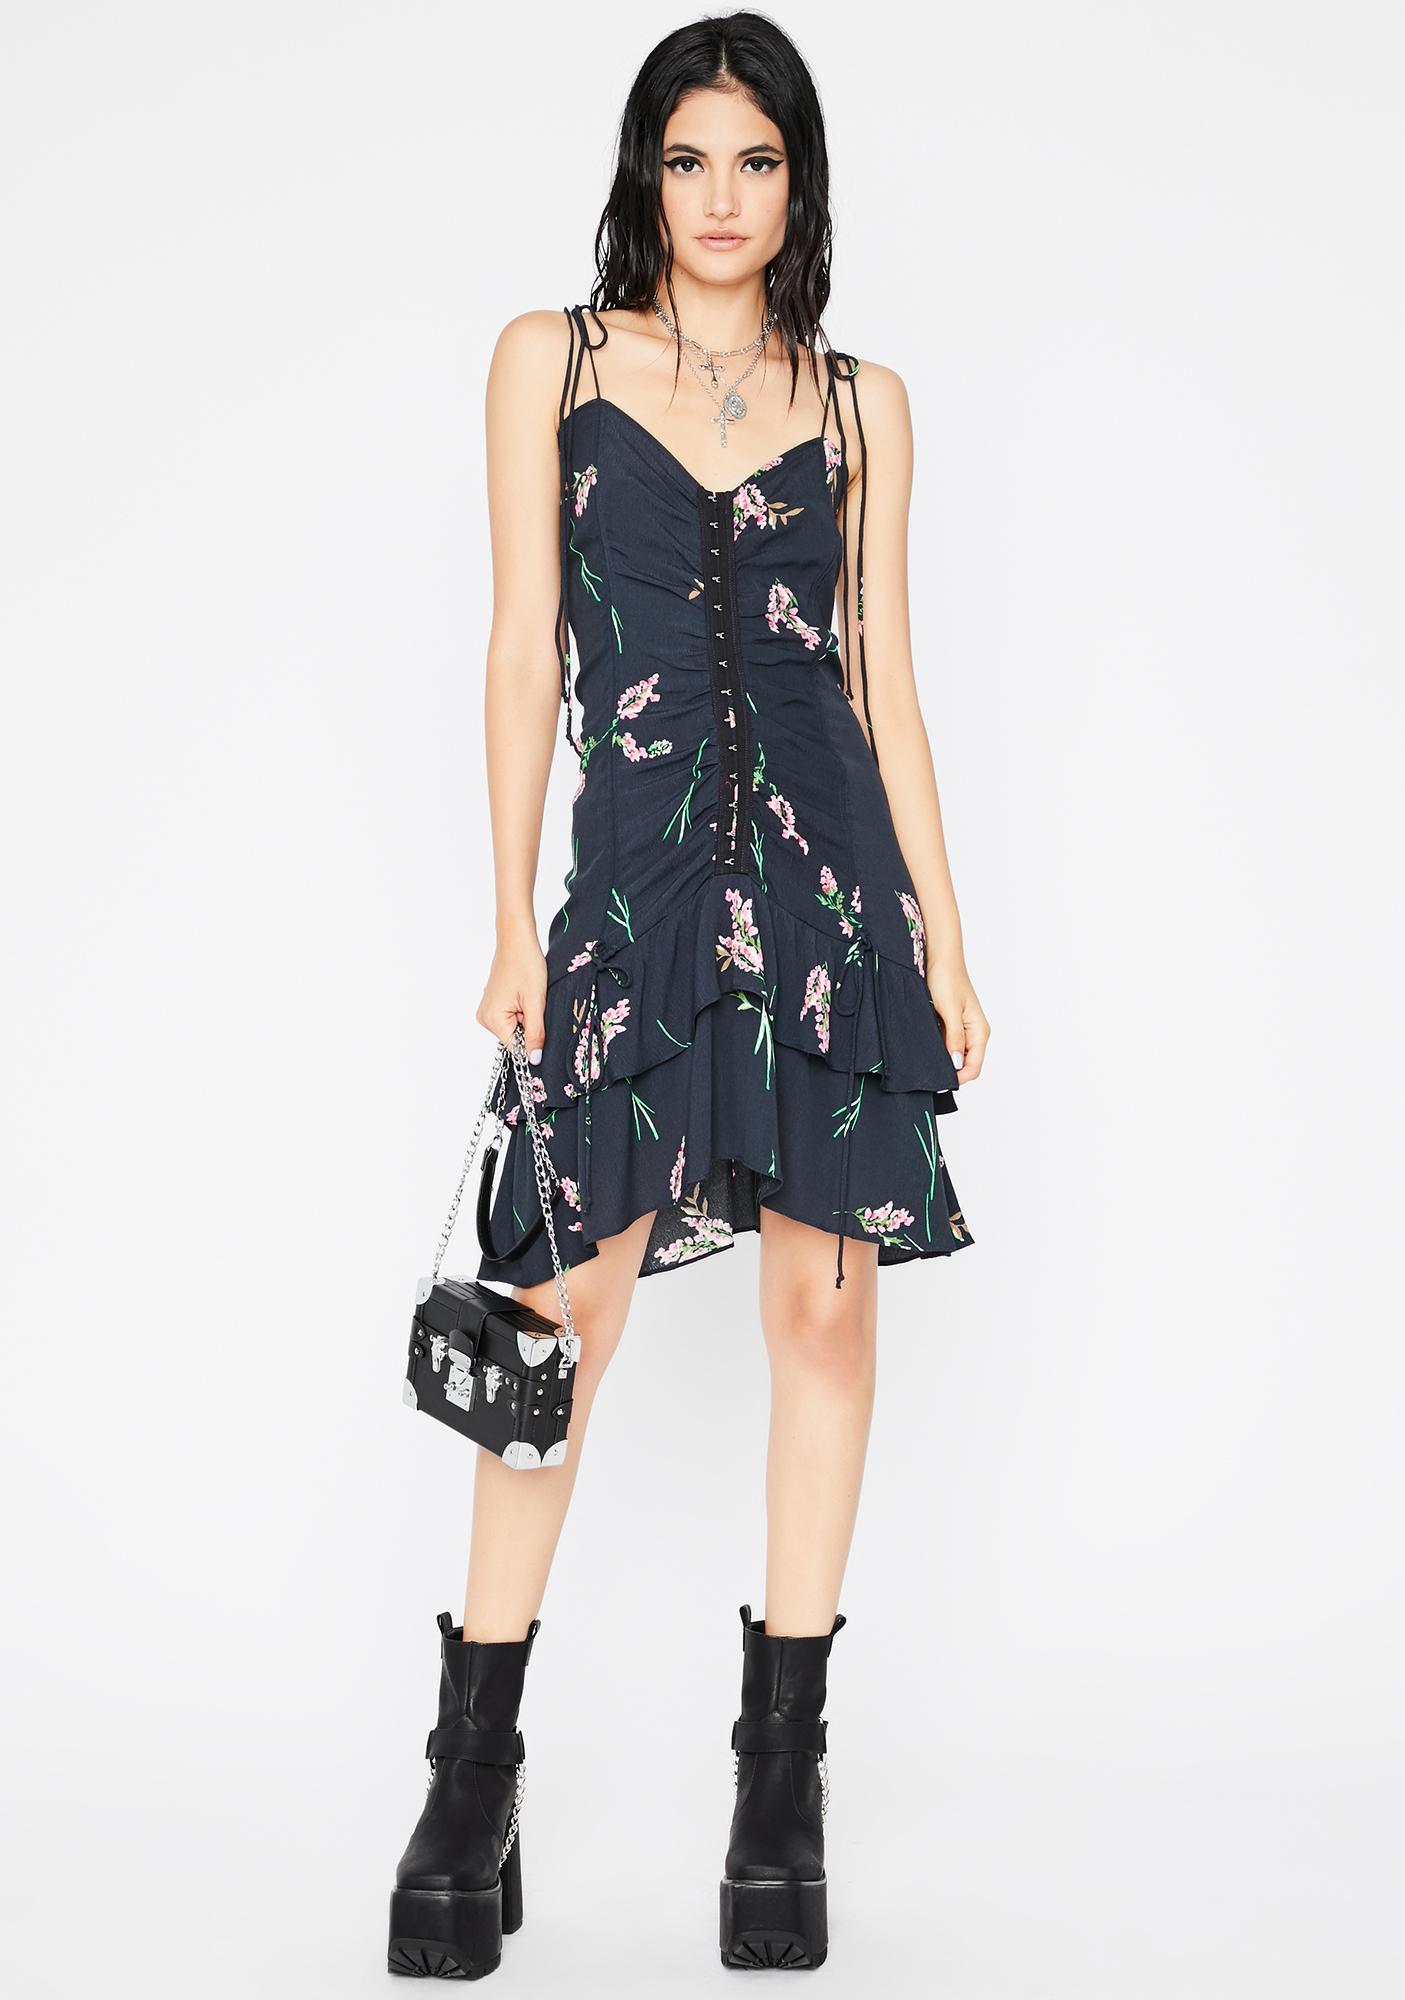 Call Me Bae Floral Dress